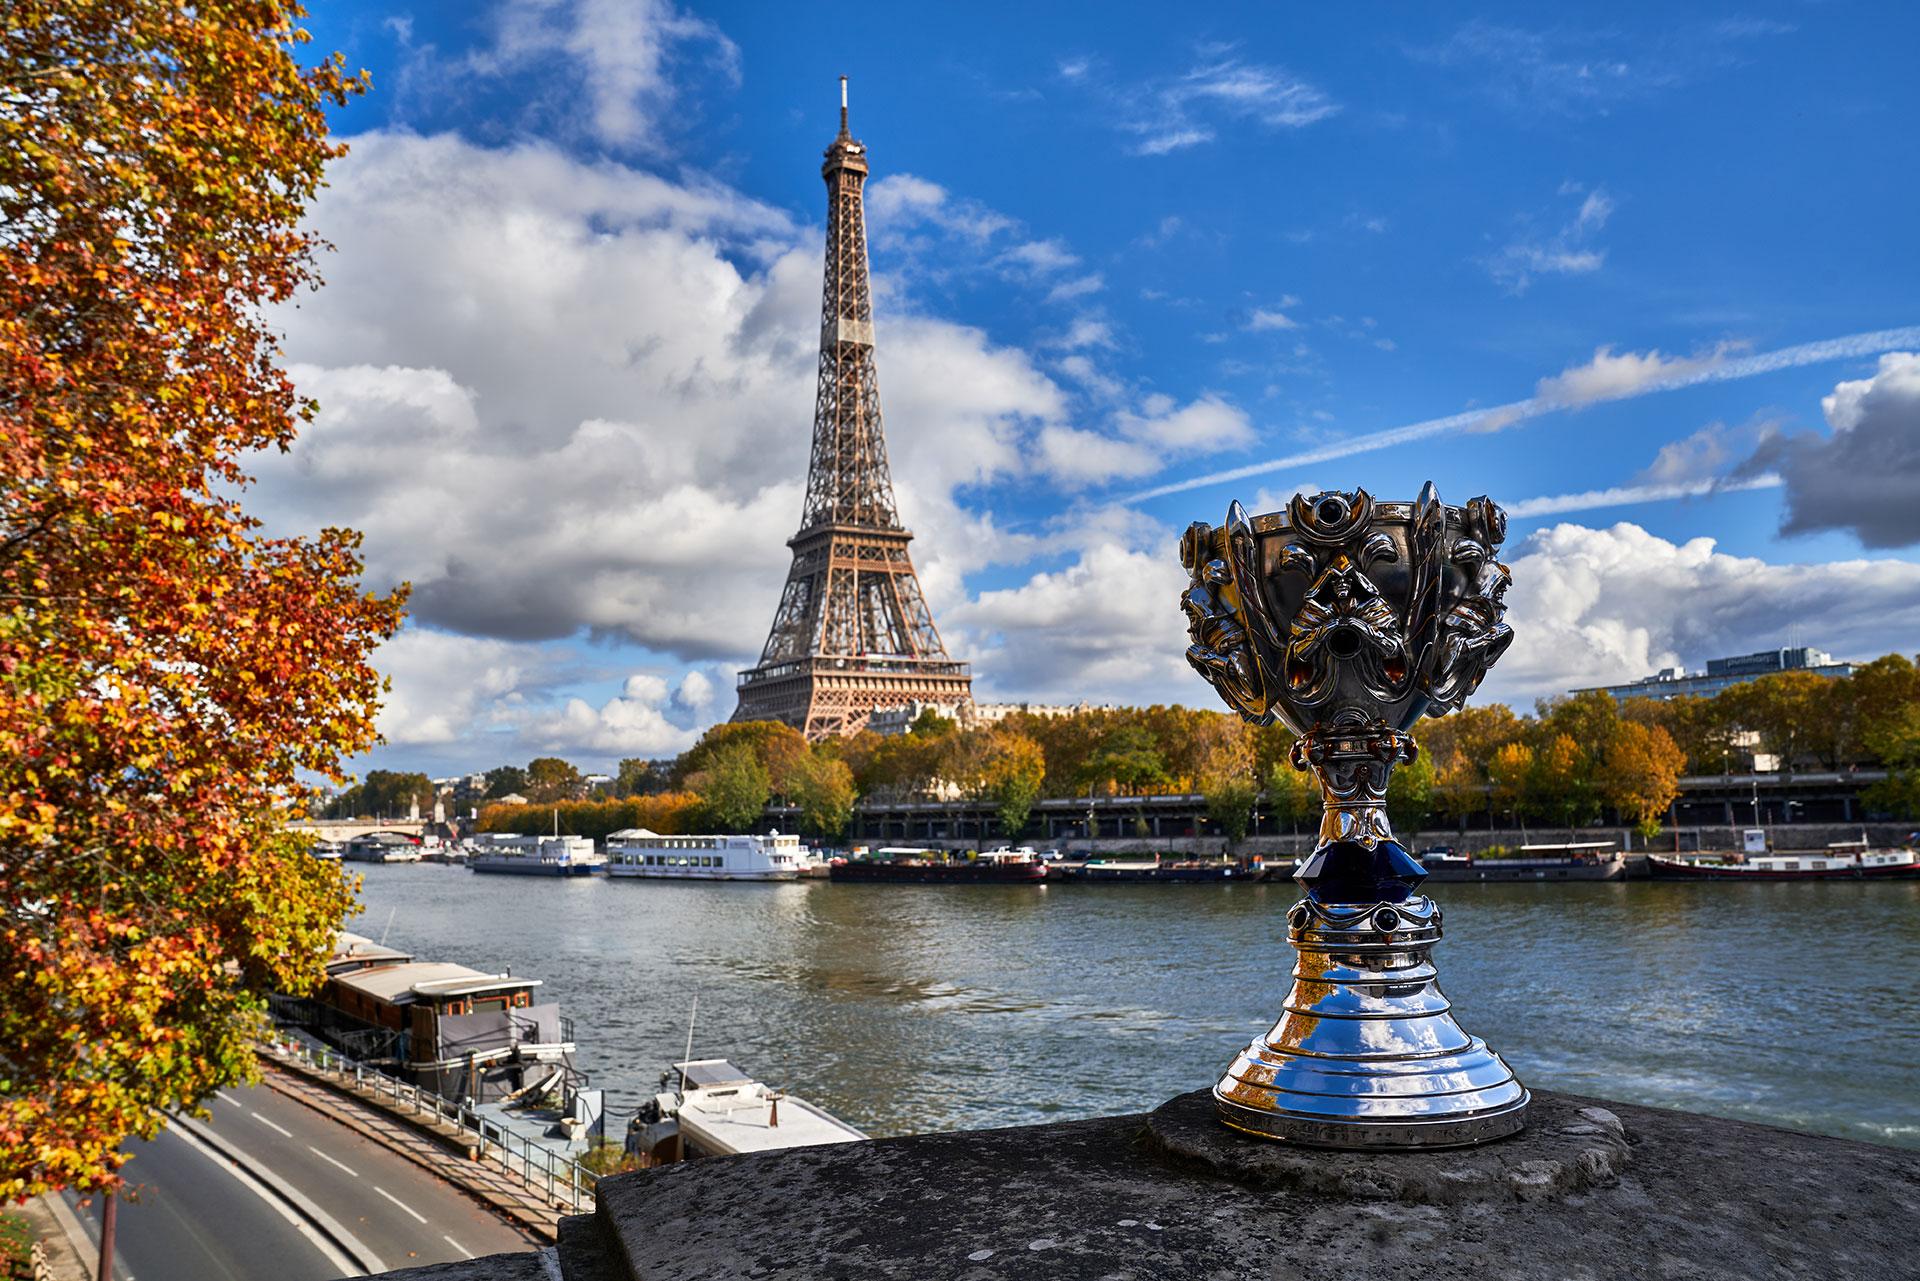 SLIDESHOW-IMAGE-3---Eiffel-Tower.jpg - 636.47 kb